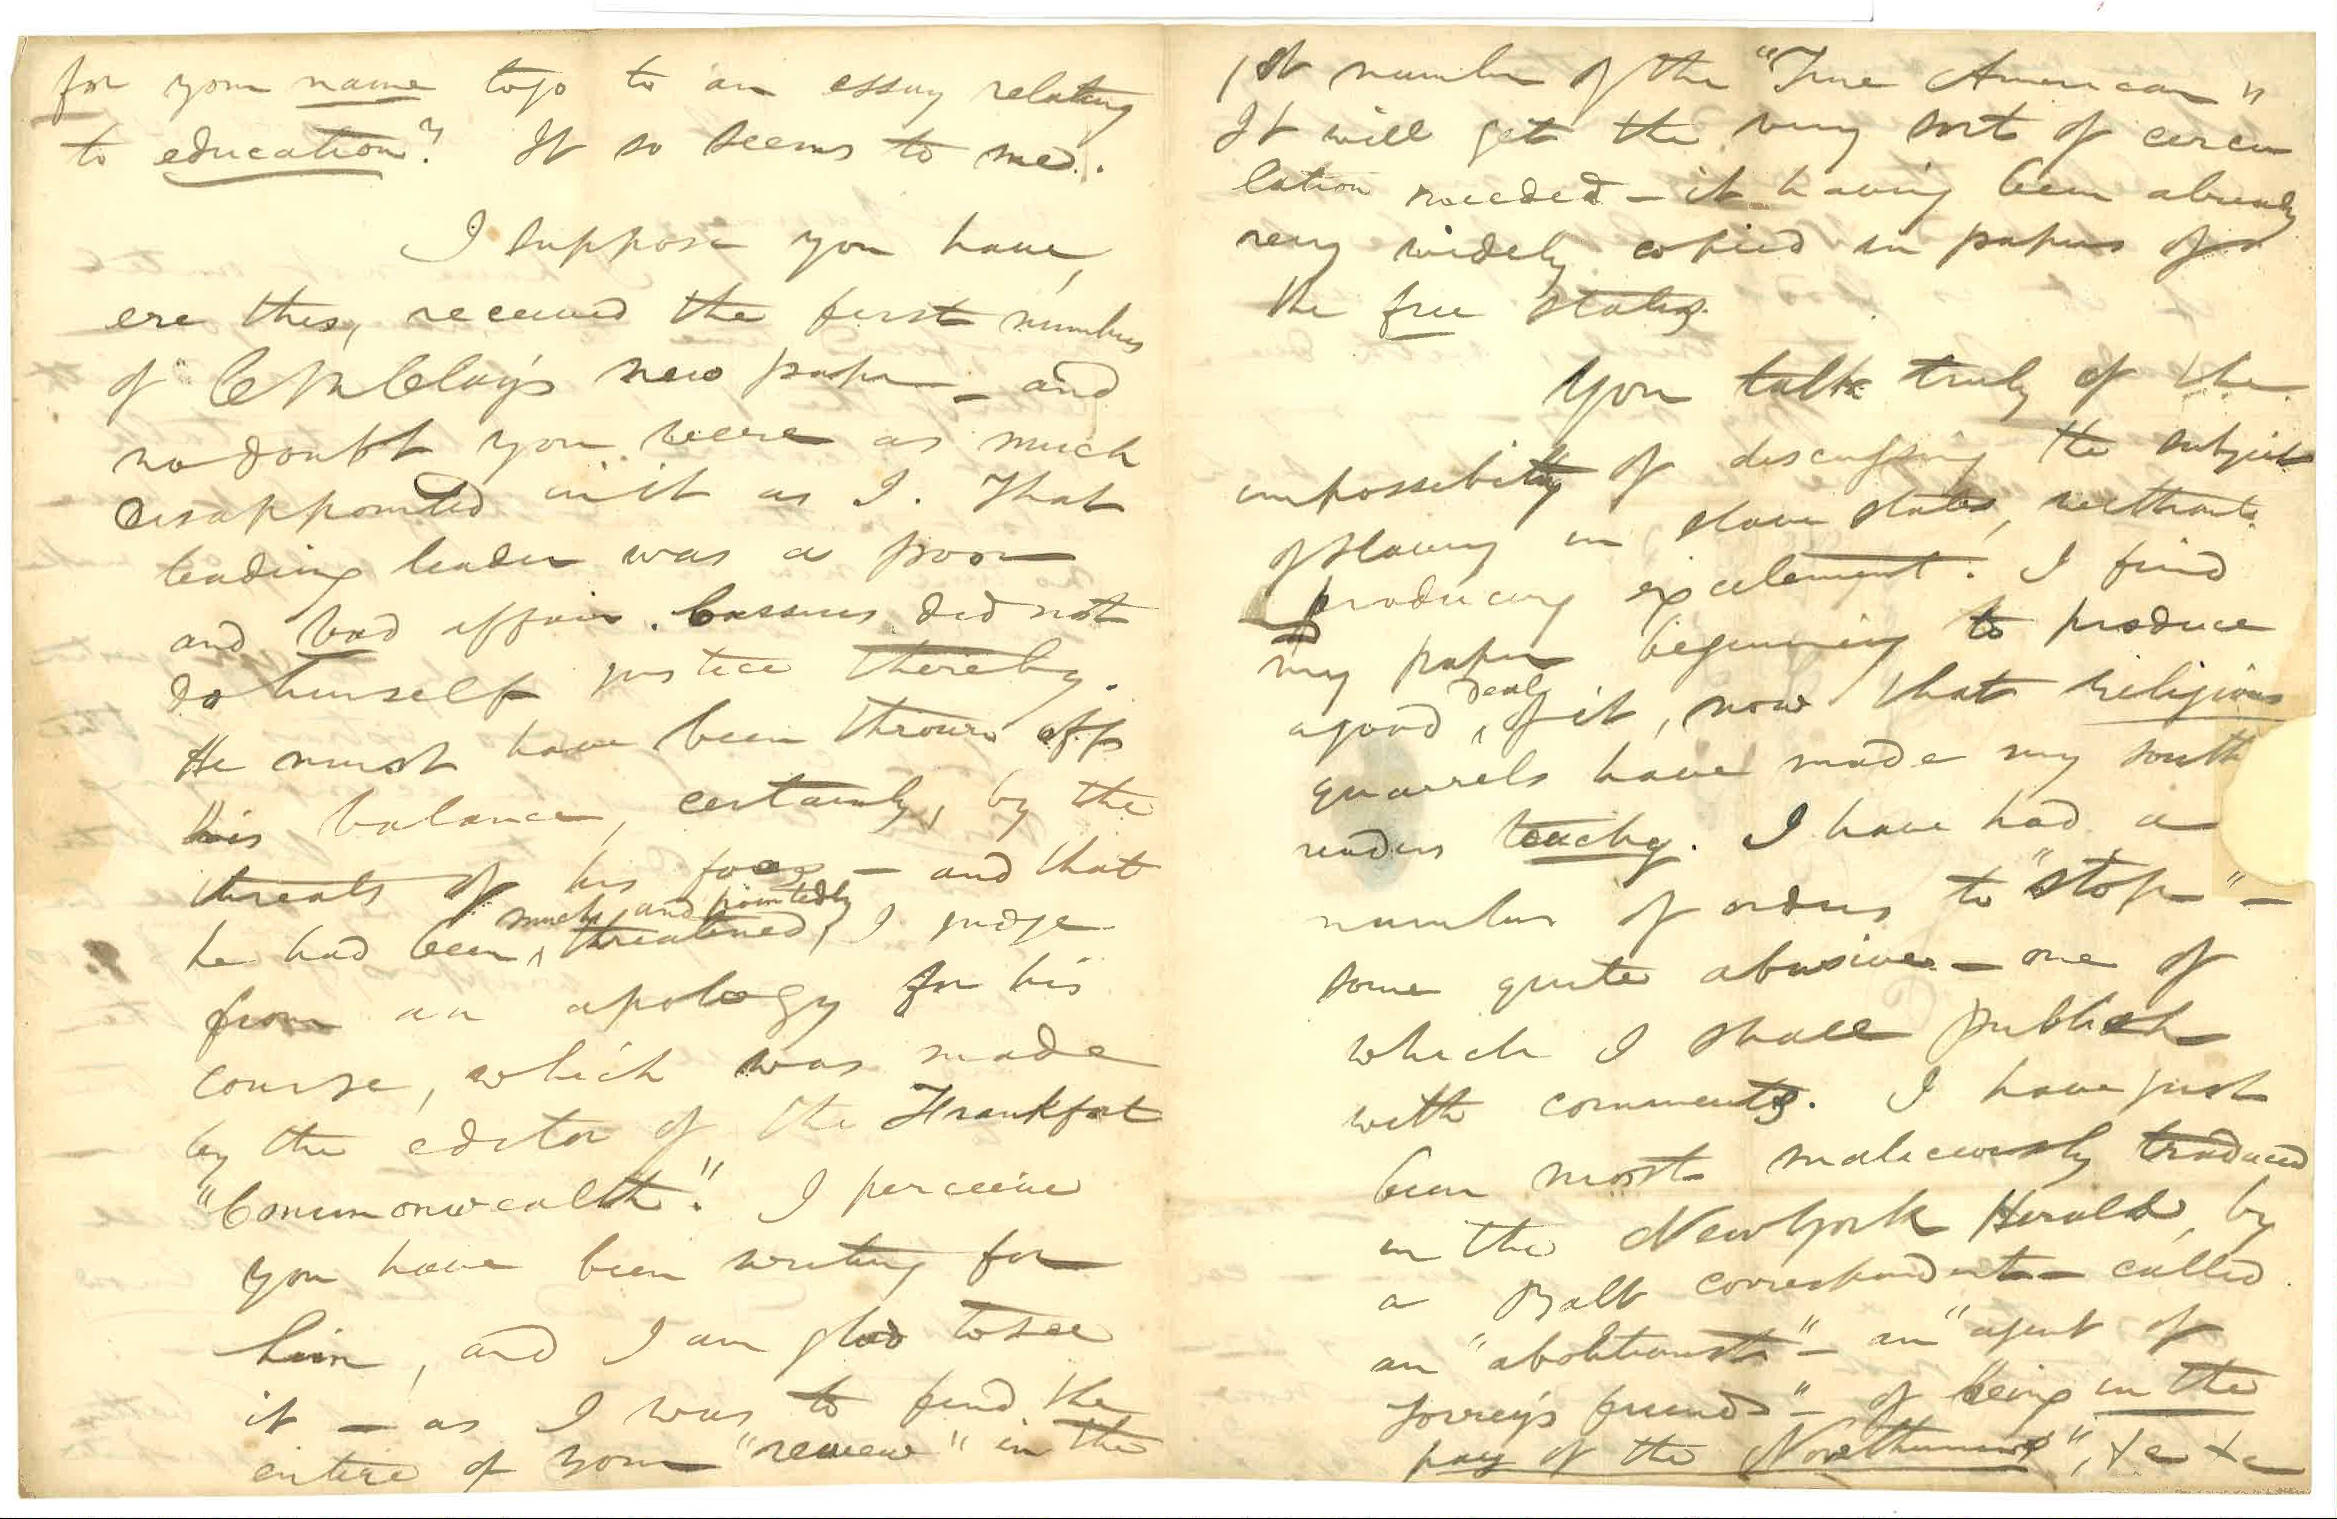 snodgrass-to-janney-1845-pg-2.jpg